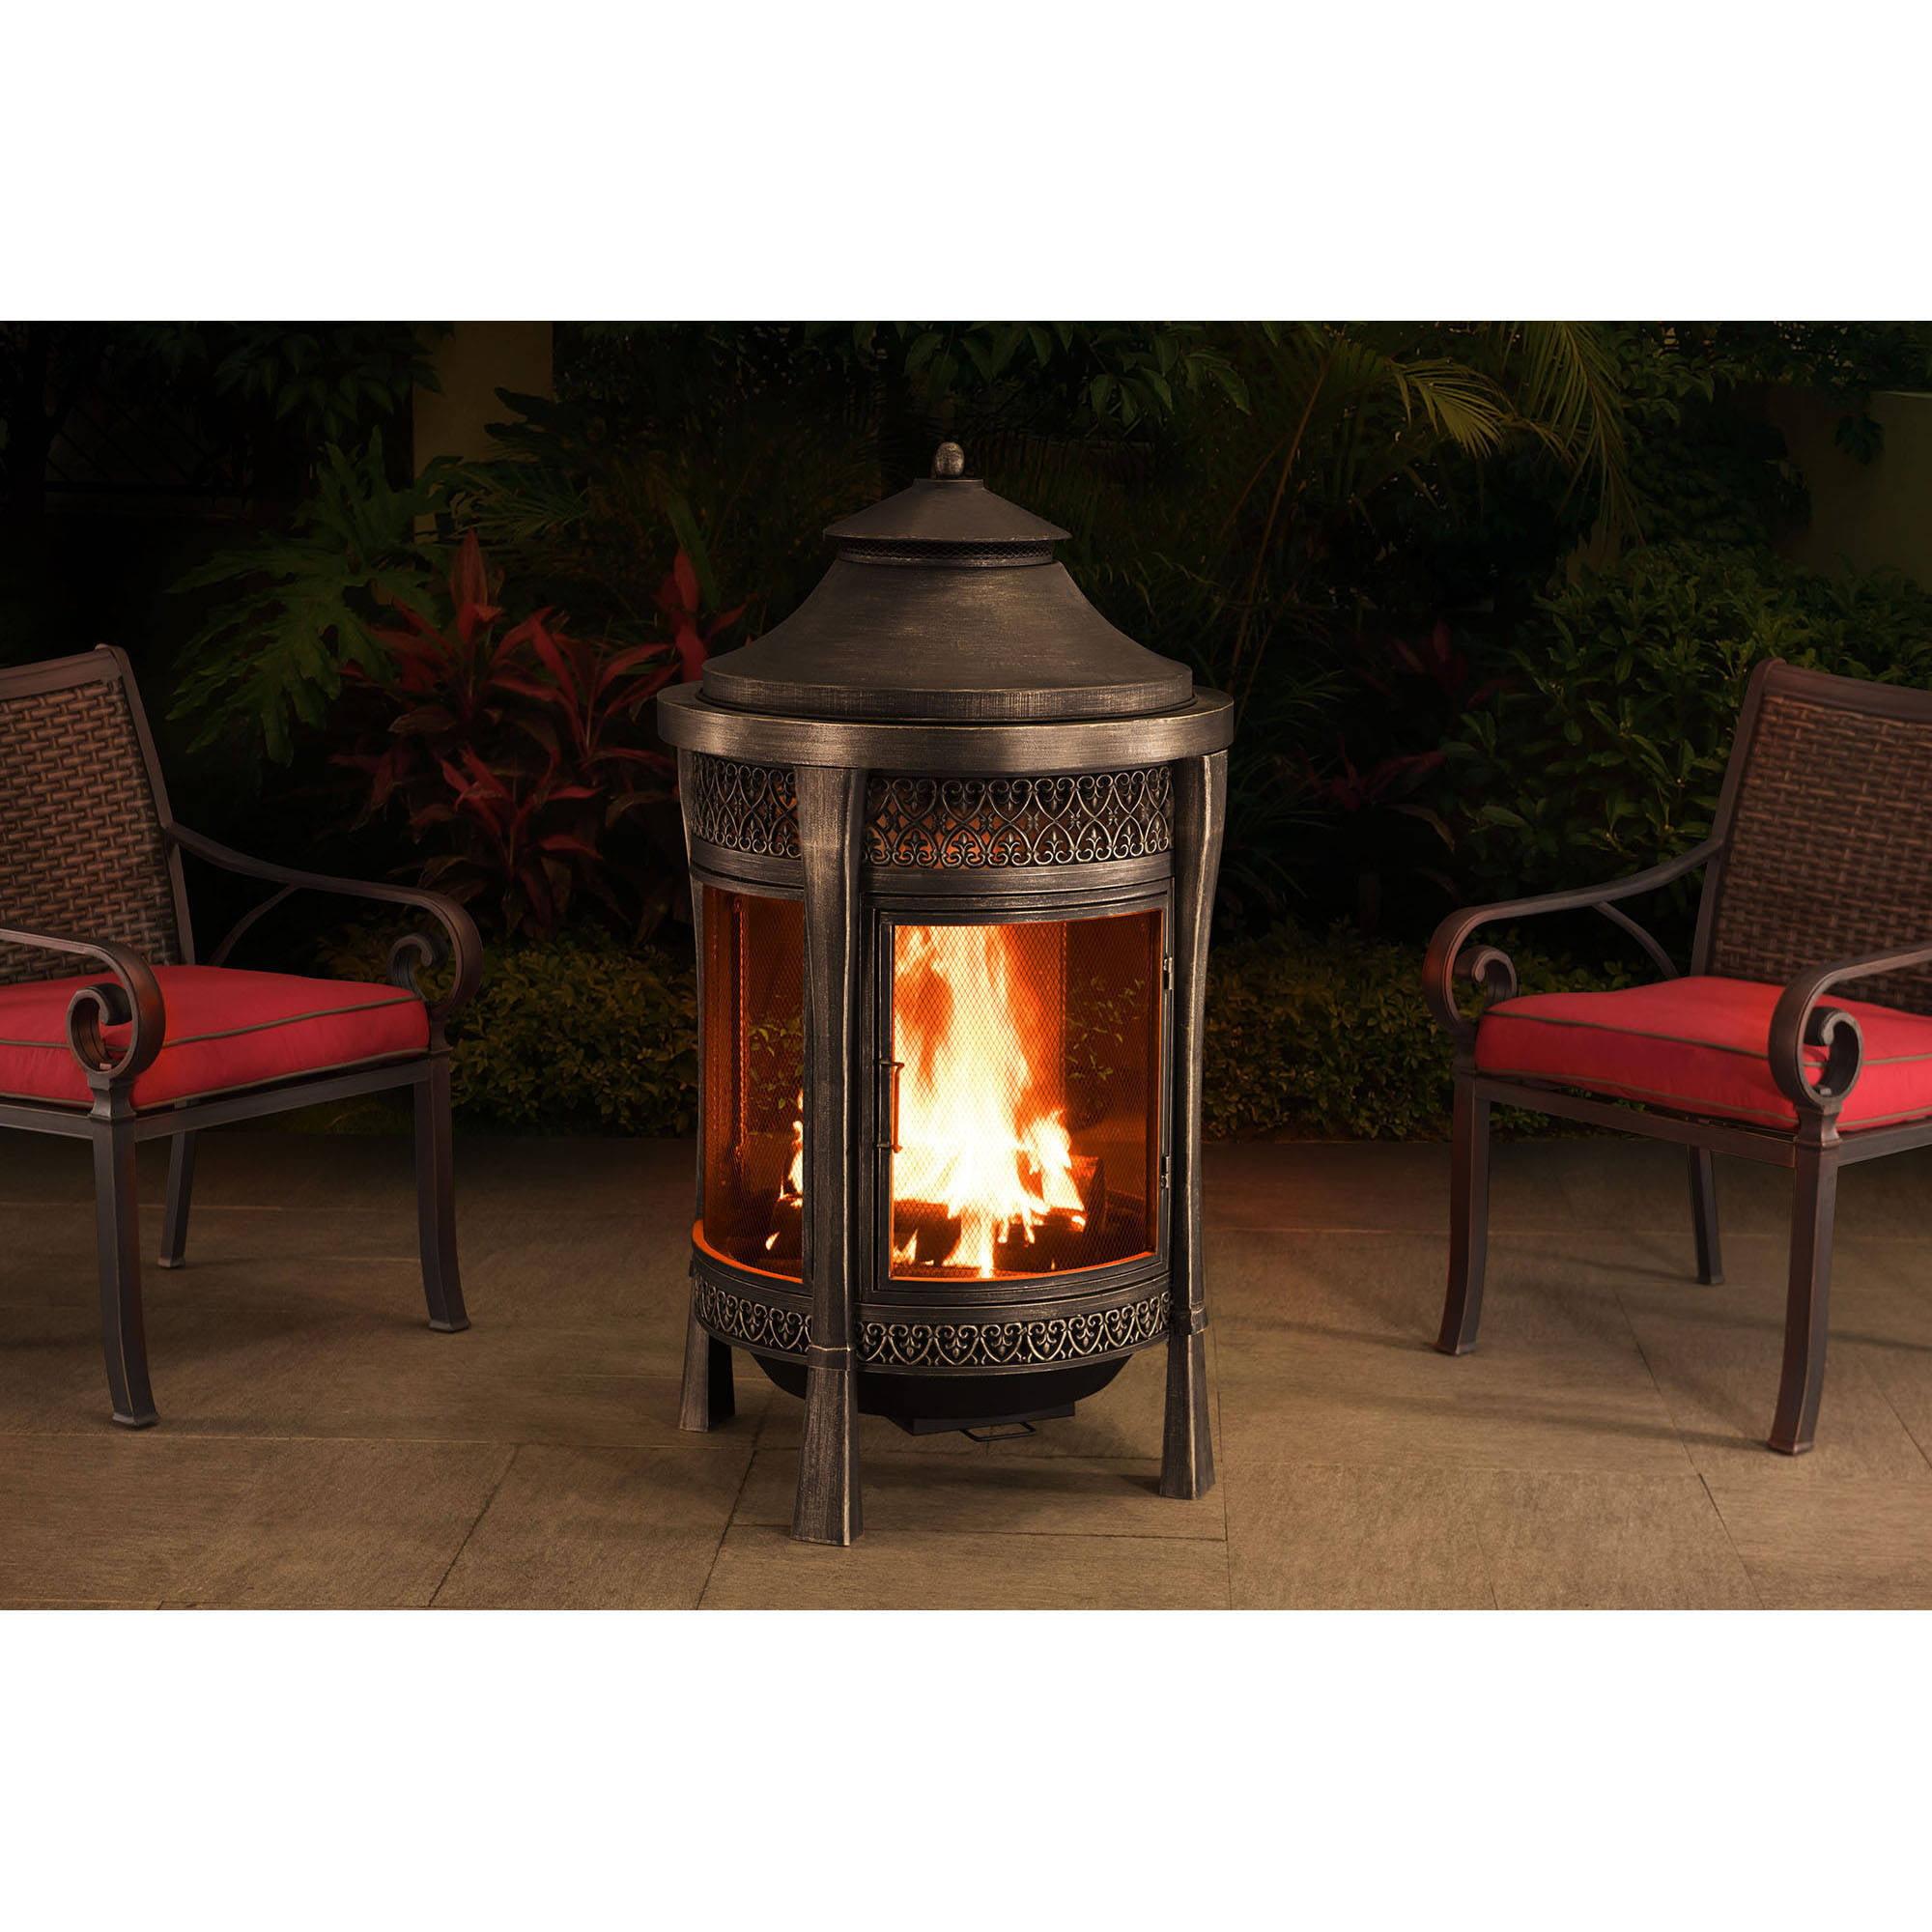 sunjoy 110504002 brown 62 cast steel outdoor fireplace